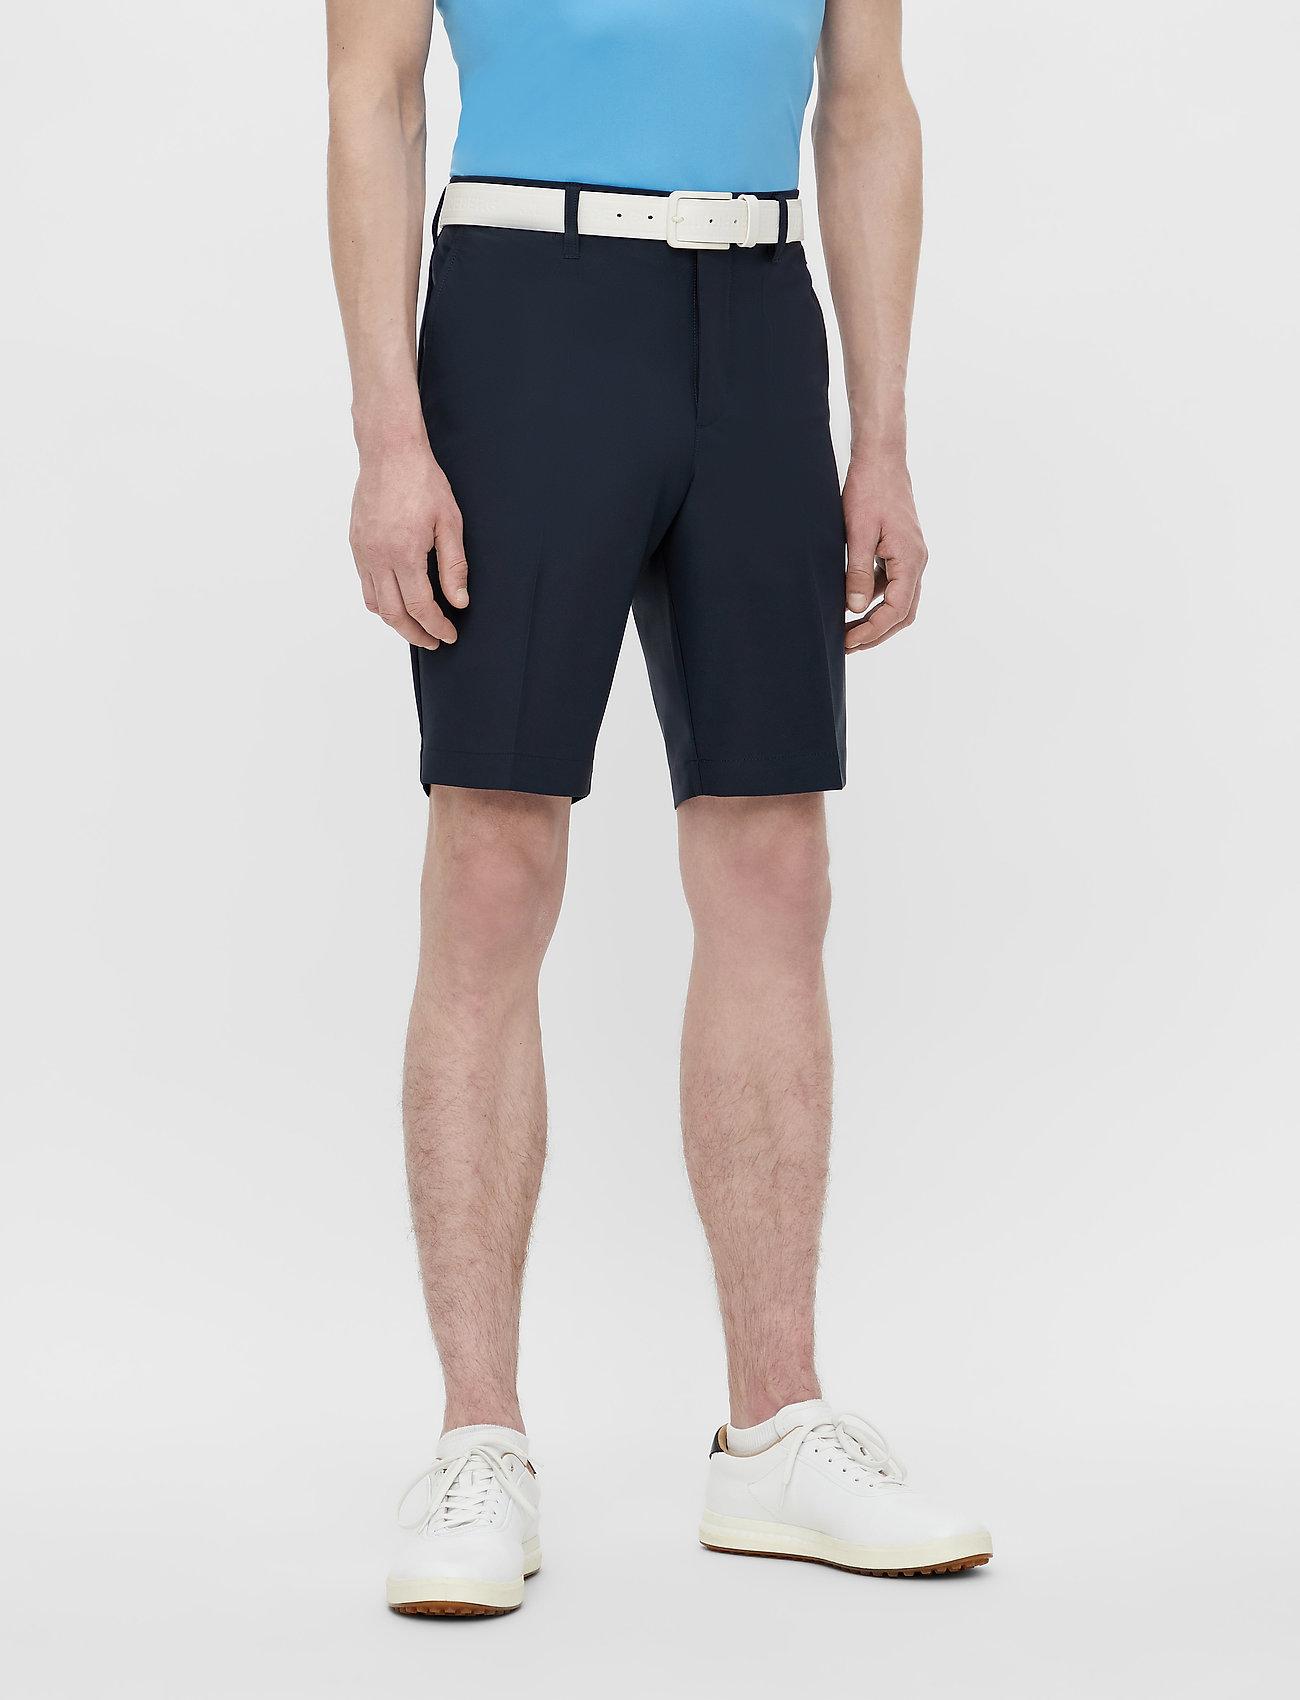 J. Lindeberg Golf - Eloy Golf Shorts - golf-shorts - jl navy - 0